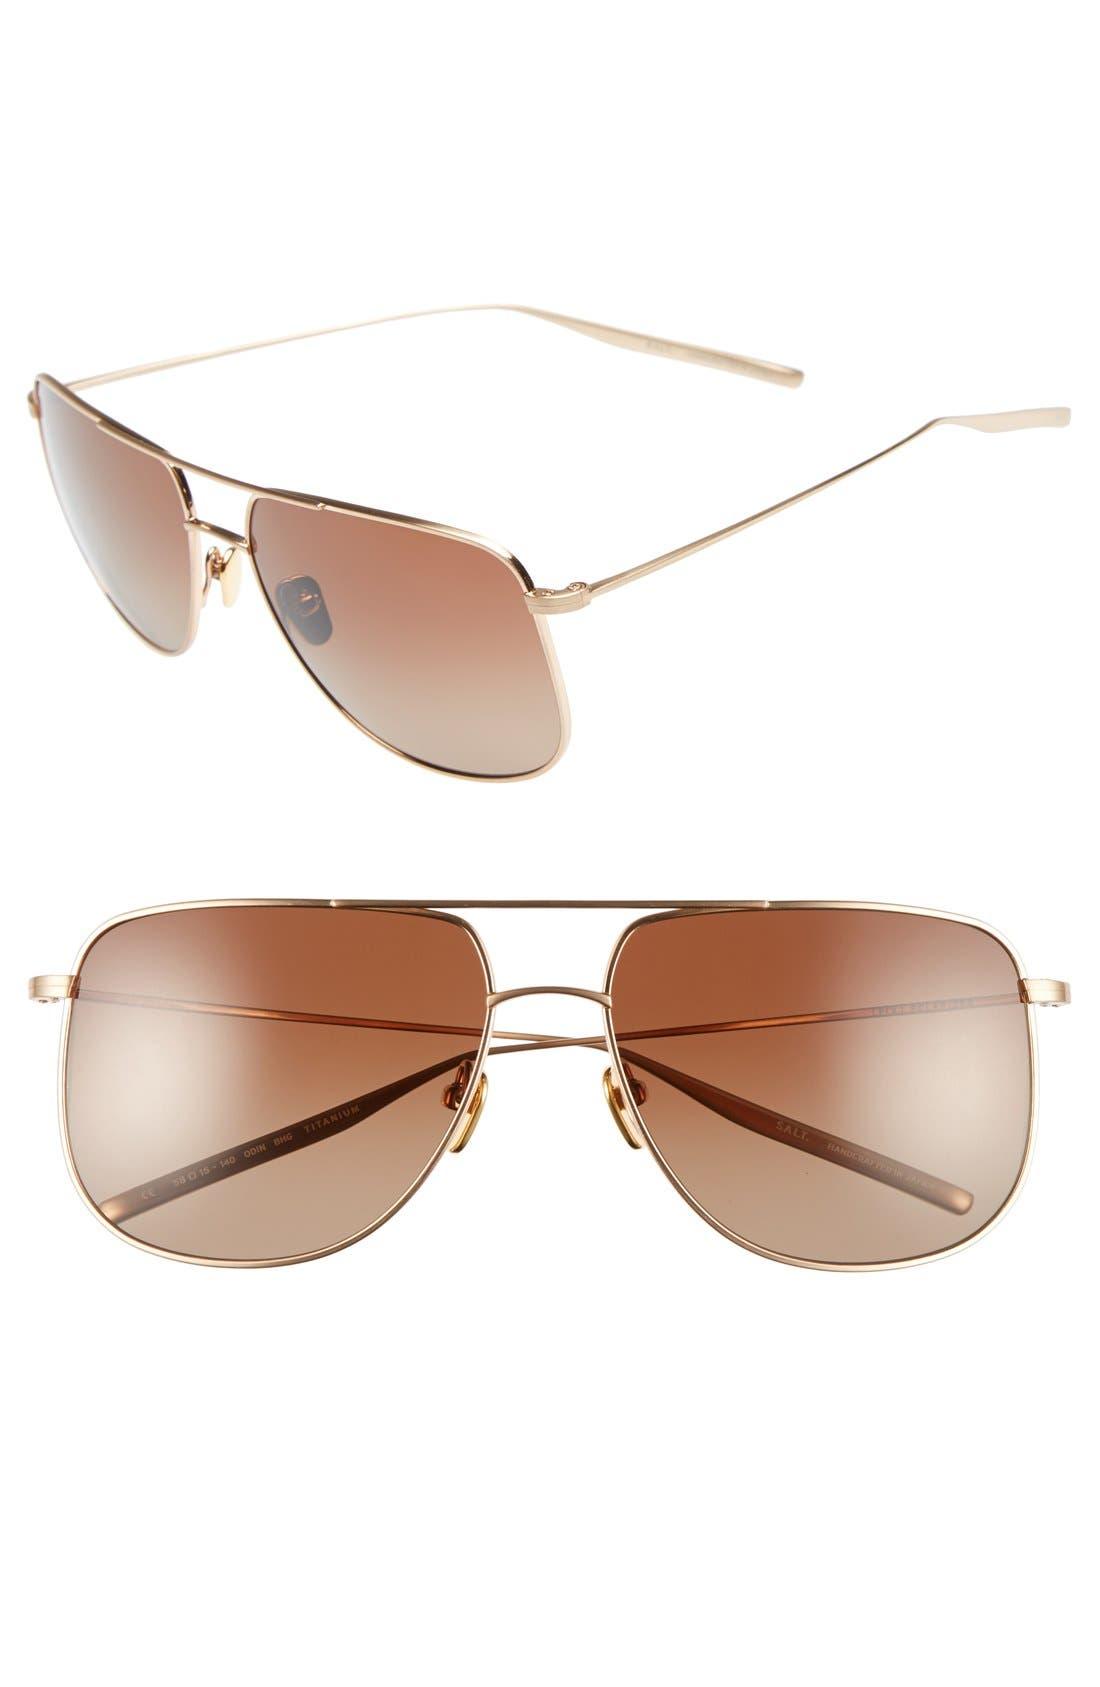 SALT Odin 58mm Polarized Sunglasses